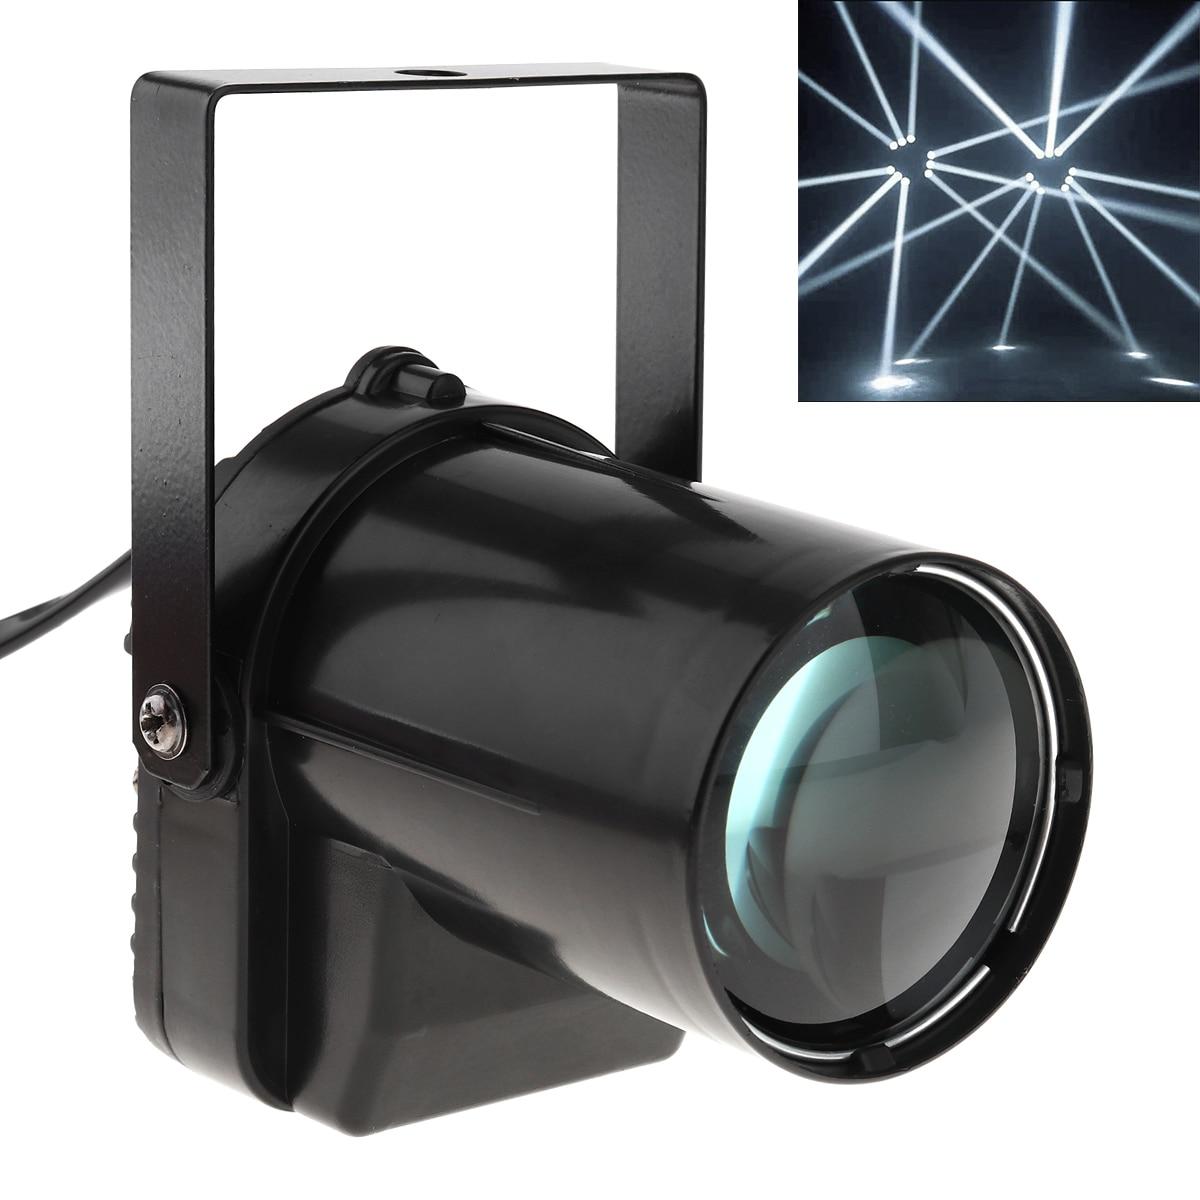 5W LED Spotlight White Beam Pin Light 200-220LM Stage Lighting Effect Lamp Suitable For DJ / Disco / KTV / Bar / Party